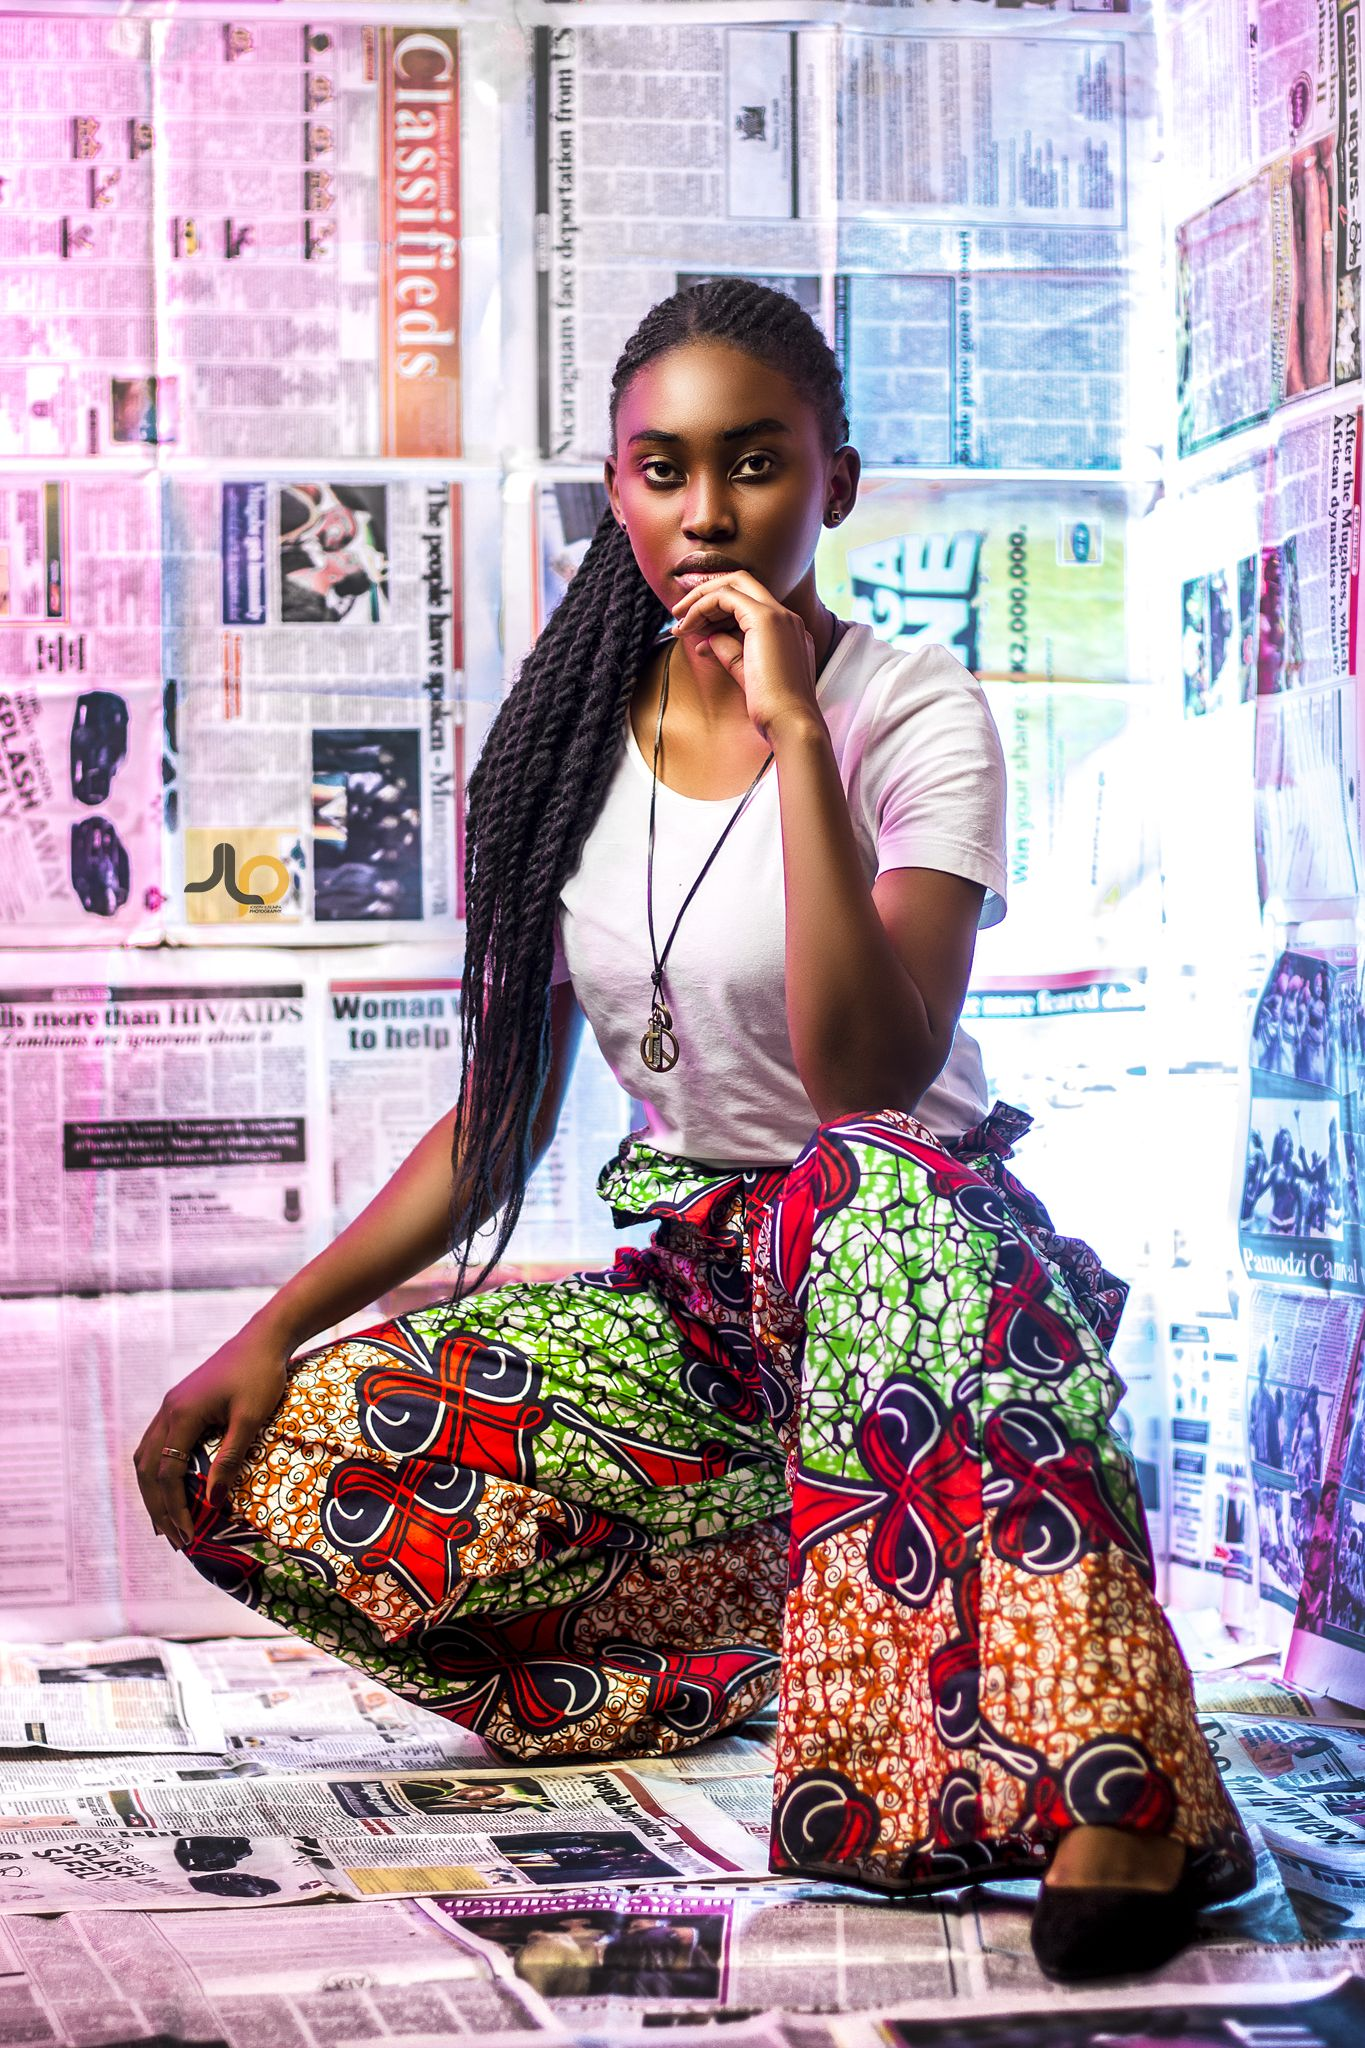 Newspaper Shoot Designer Clothes Artistic Fashion Photography Creative Fashion Photography Creative Photoshoot Ideas